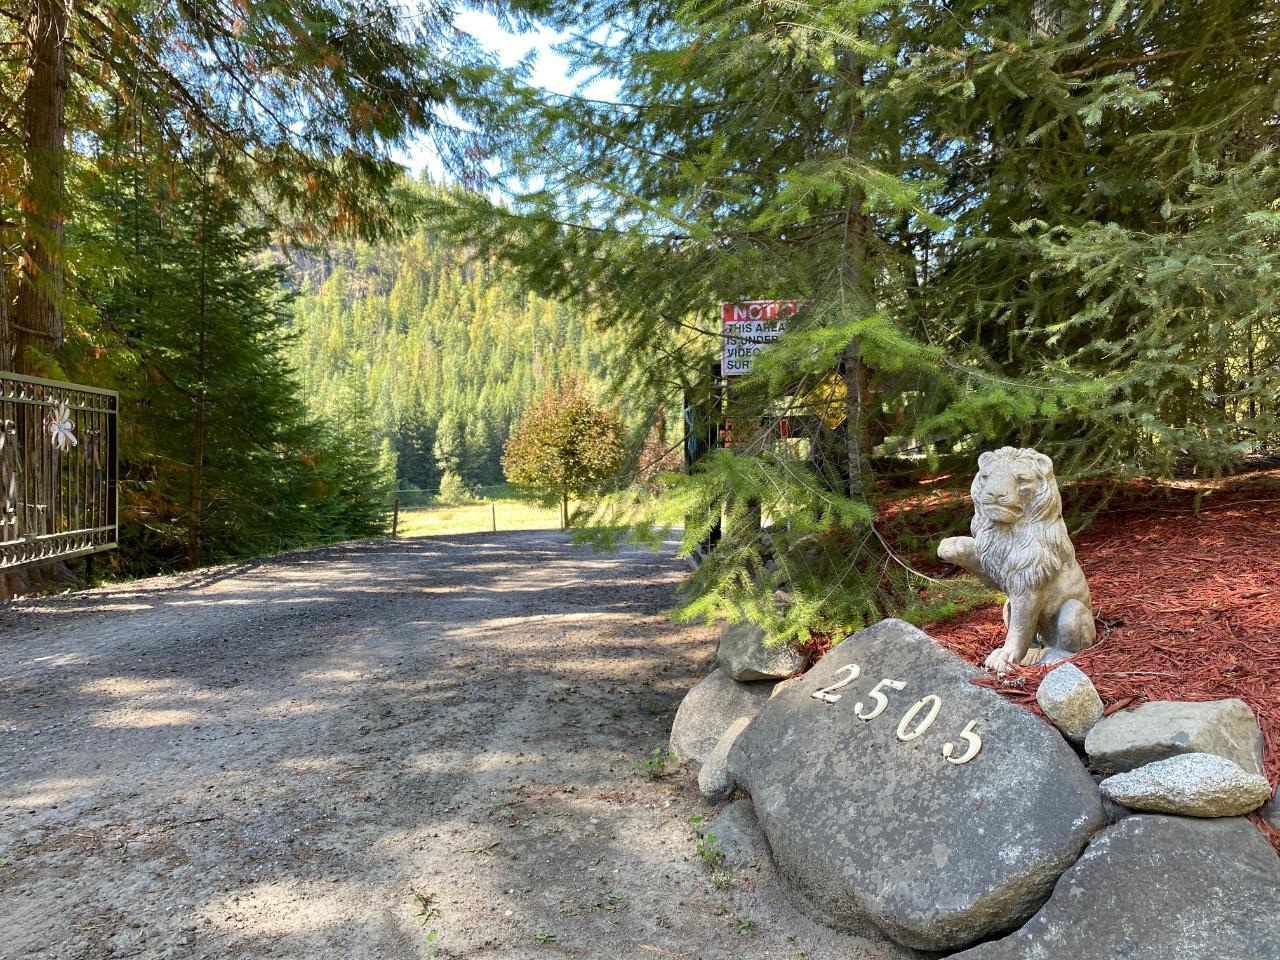 2505 Barley Road, Rossland, British Columbia  V0G 1Y0 - Photo 3 - 2461148